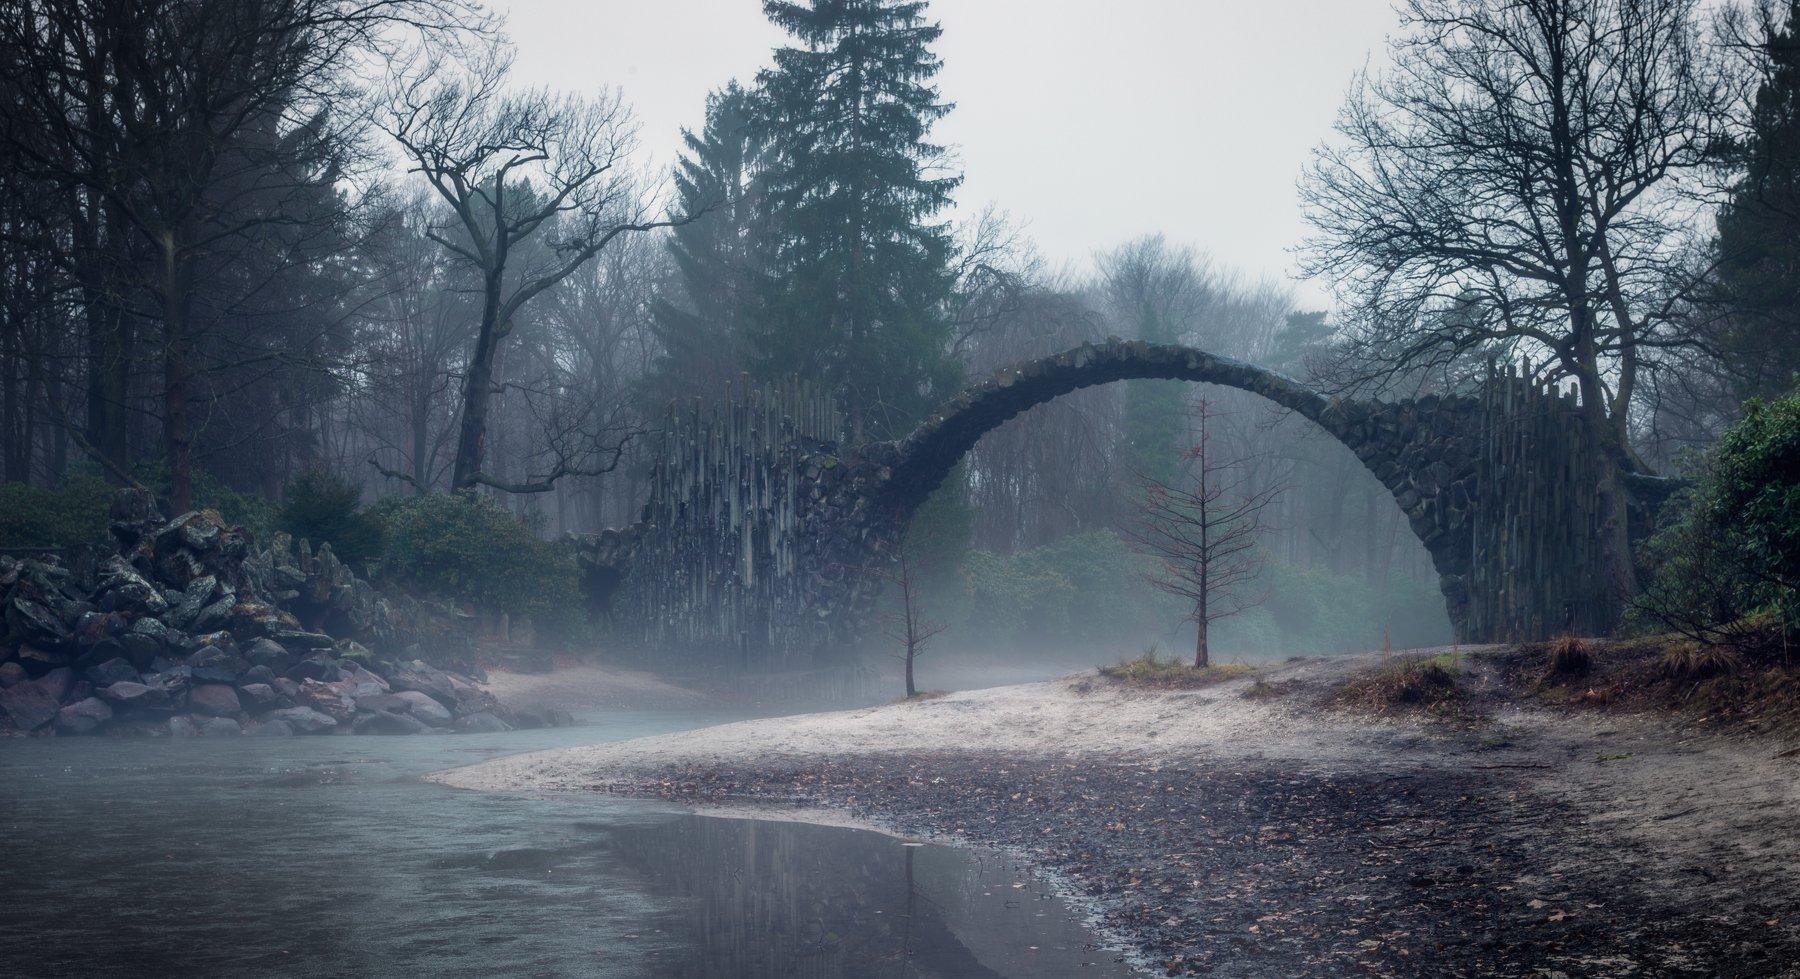 мост, туман, пейзаж, утро, вода, озеро, Ракотц, Германия, Алексей Чумаков